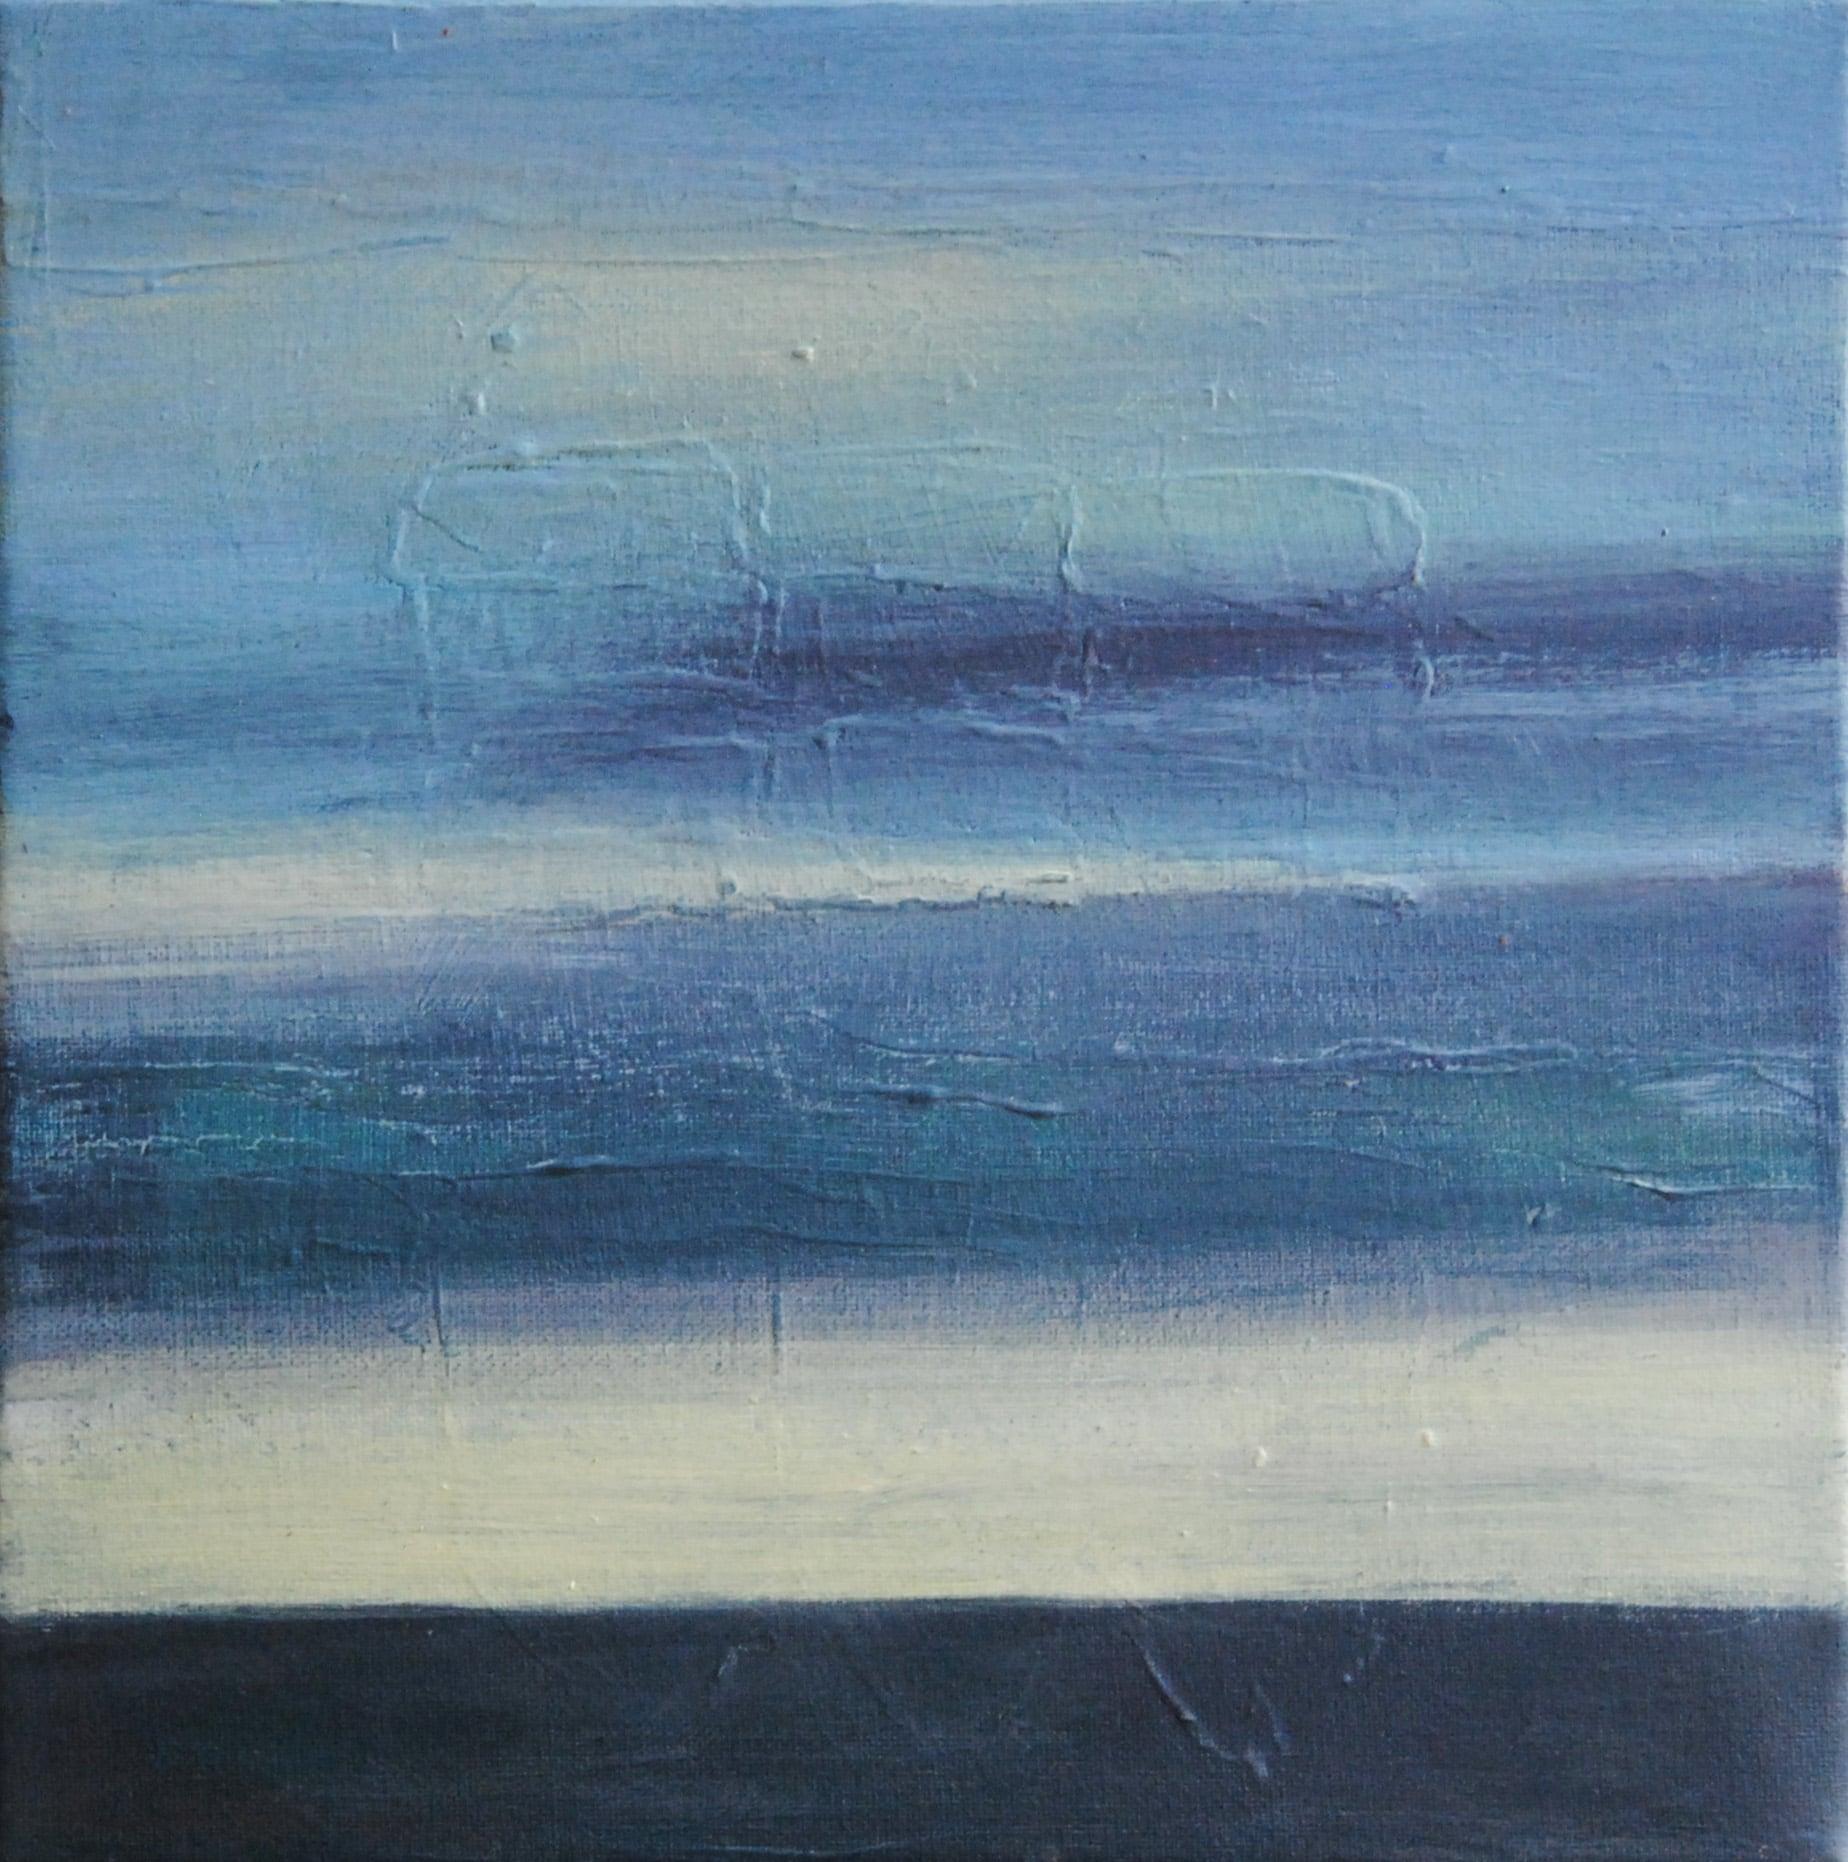 abstrakte Malerei kaufen: Landschaft, Nordsee, Meer, Himmel